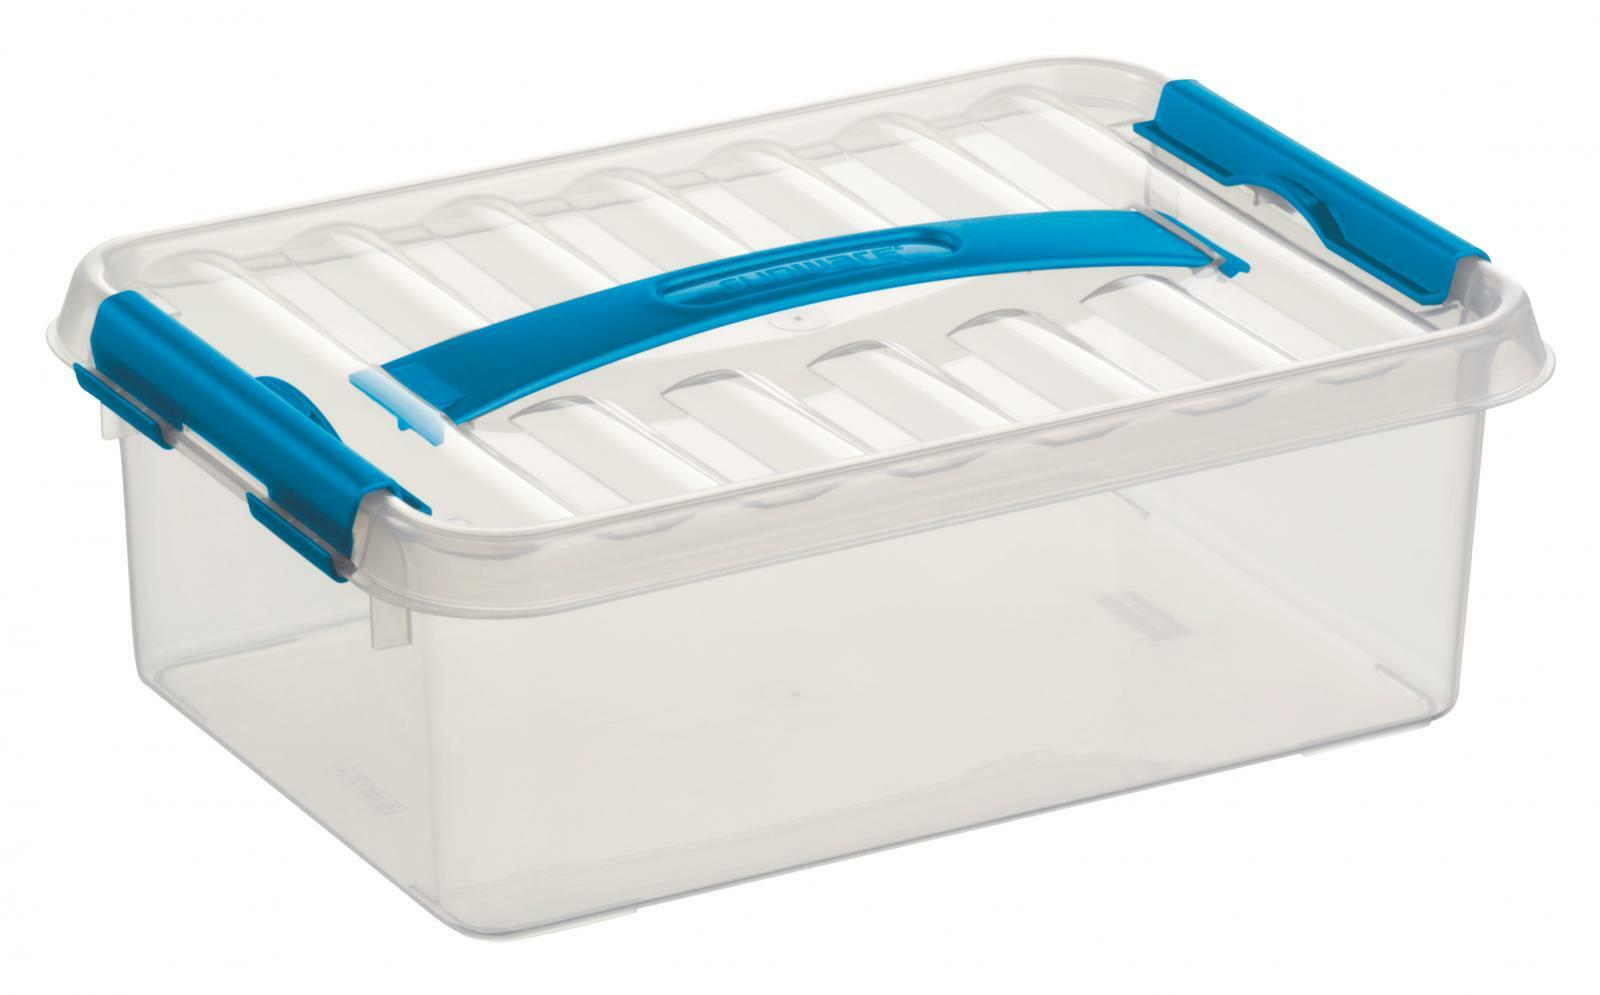 6 x SUNWARE Q-Line Box mit Griff - 4 Liter -300 x 200 x 100 mm- transparent blau